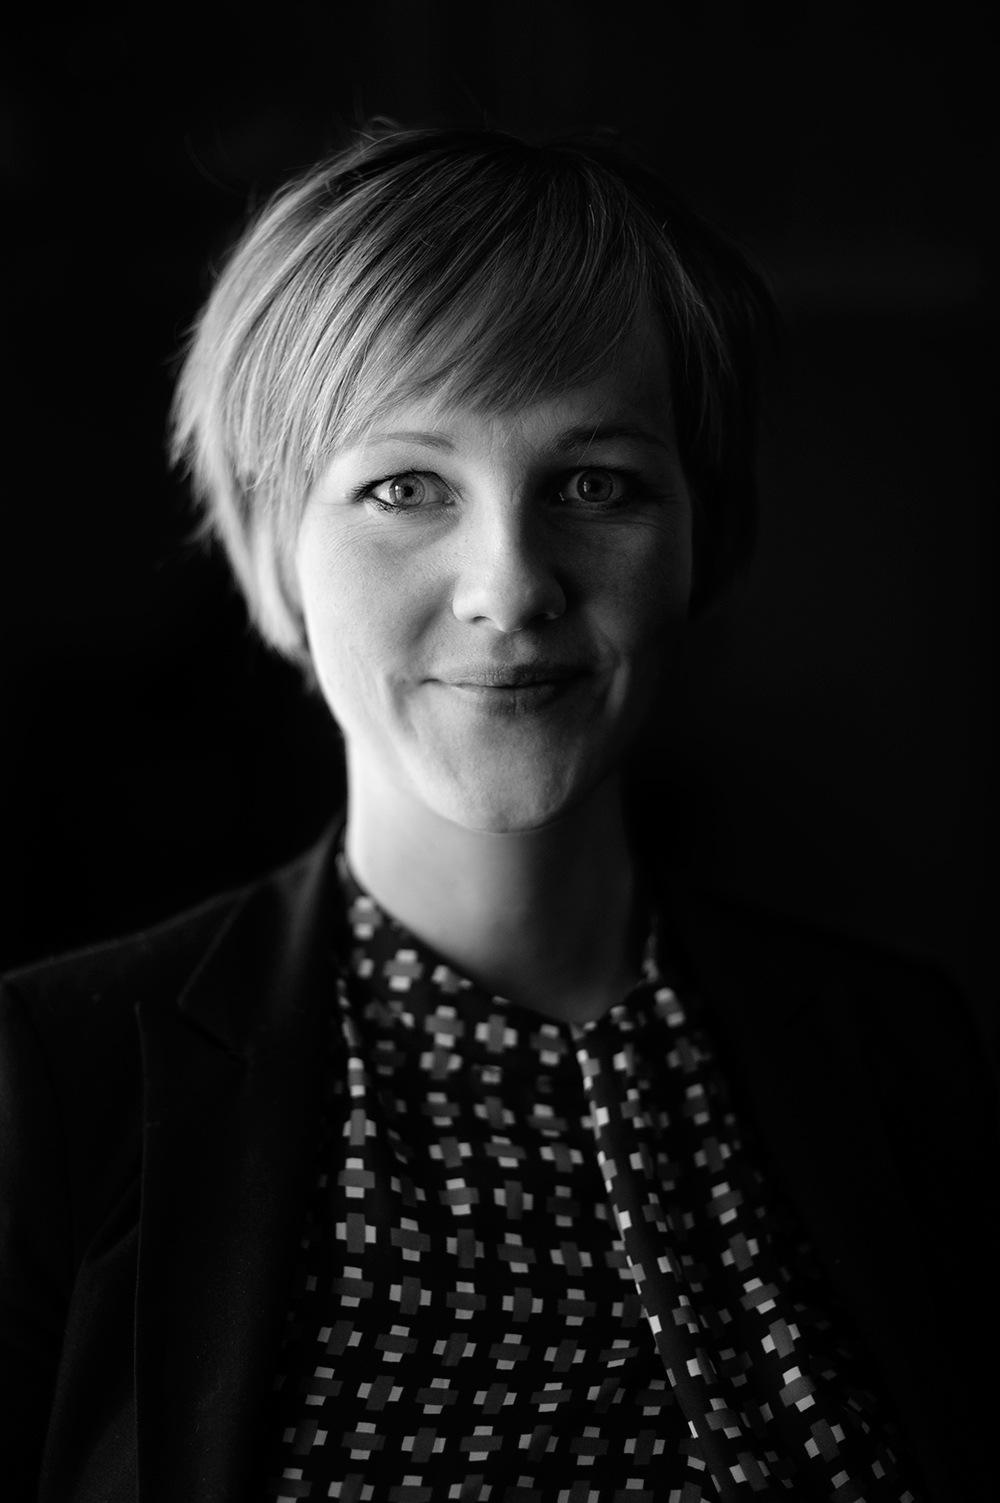 Mareike Timm | Photo Journalist - Ida Auken, former Danish minister of environment. Freelance, 2013.